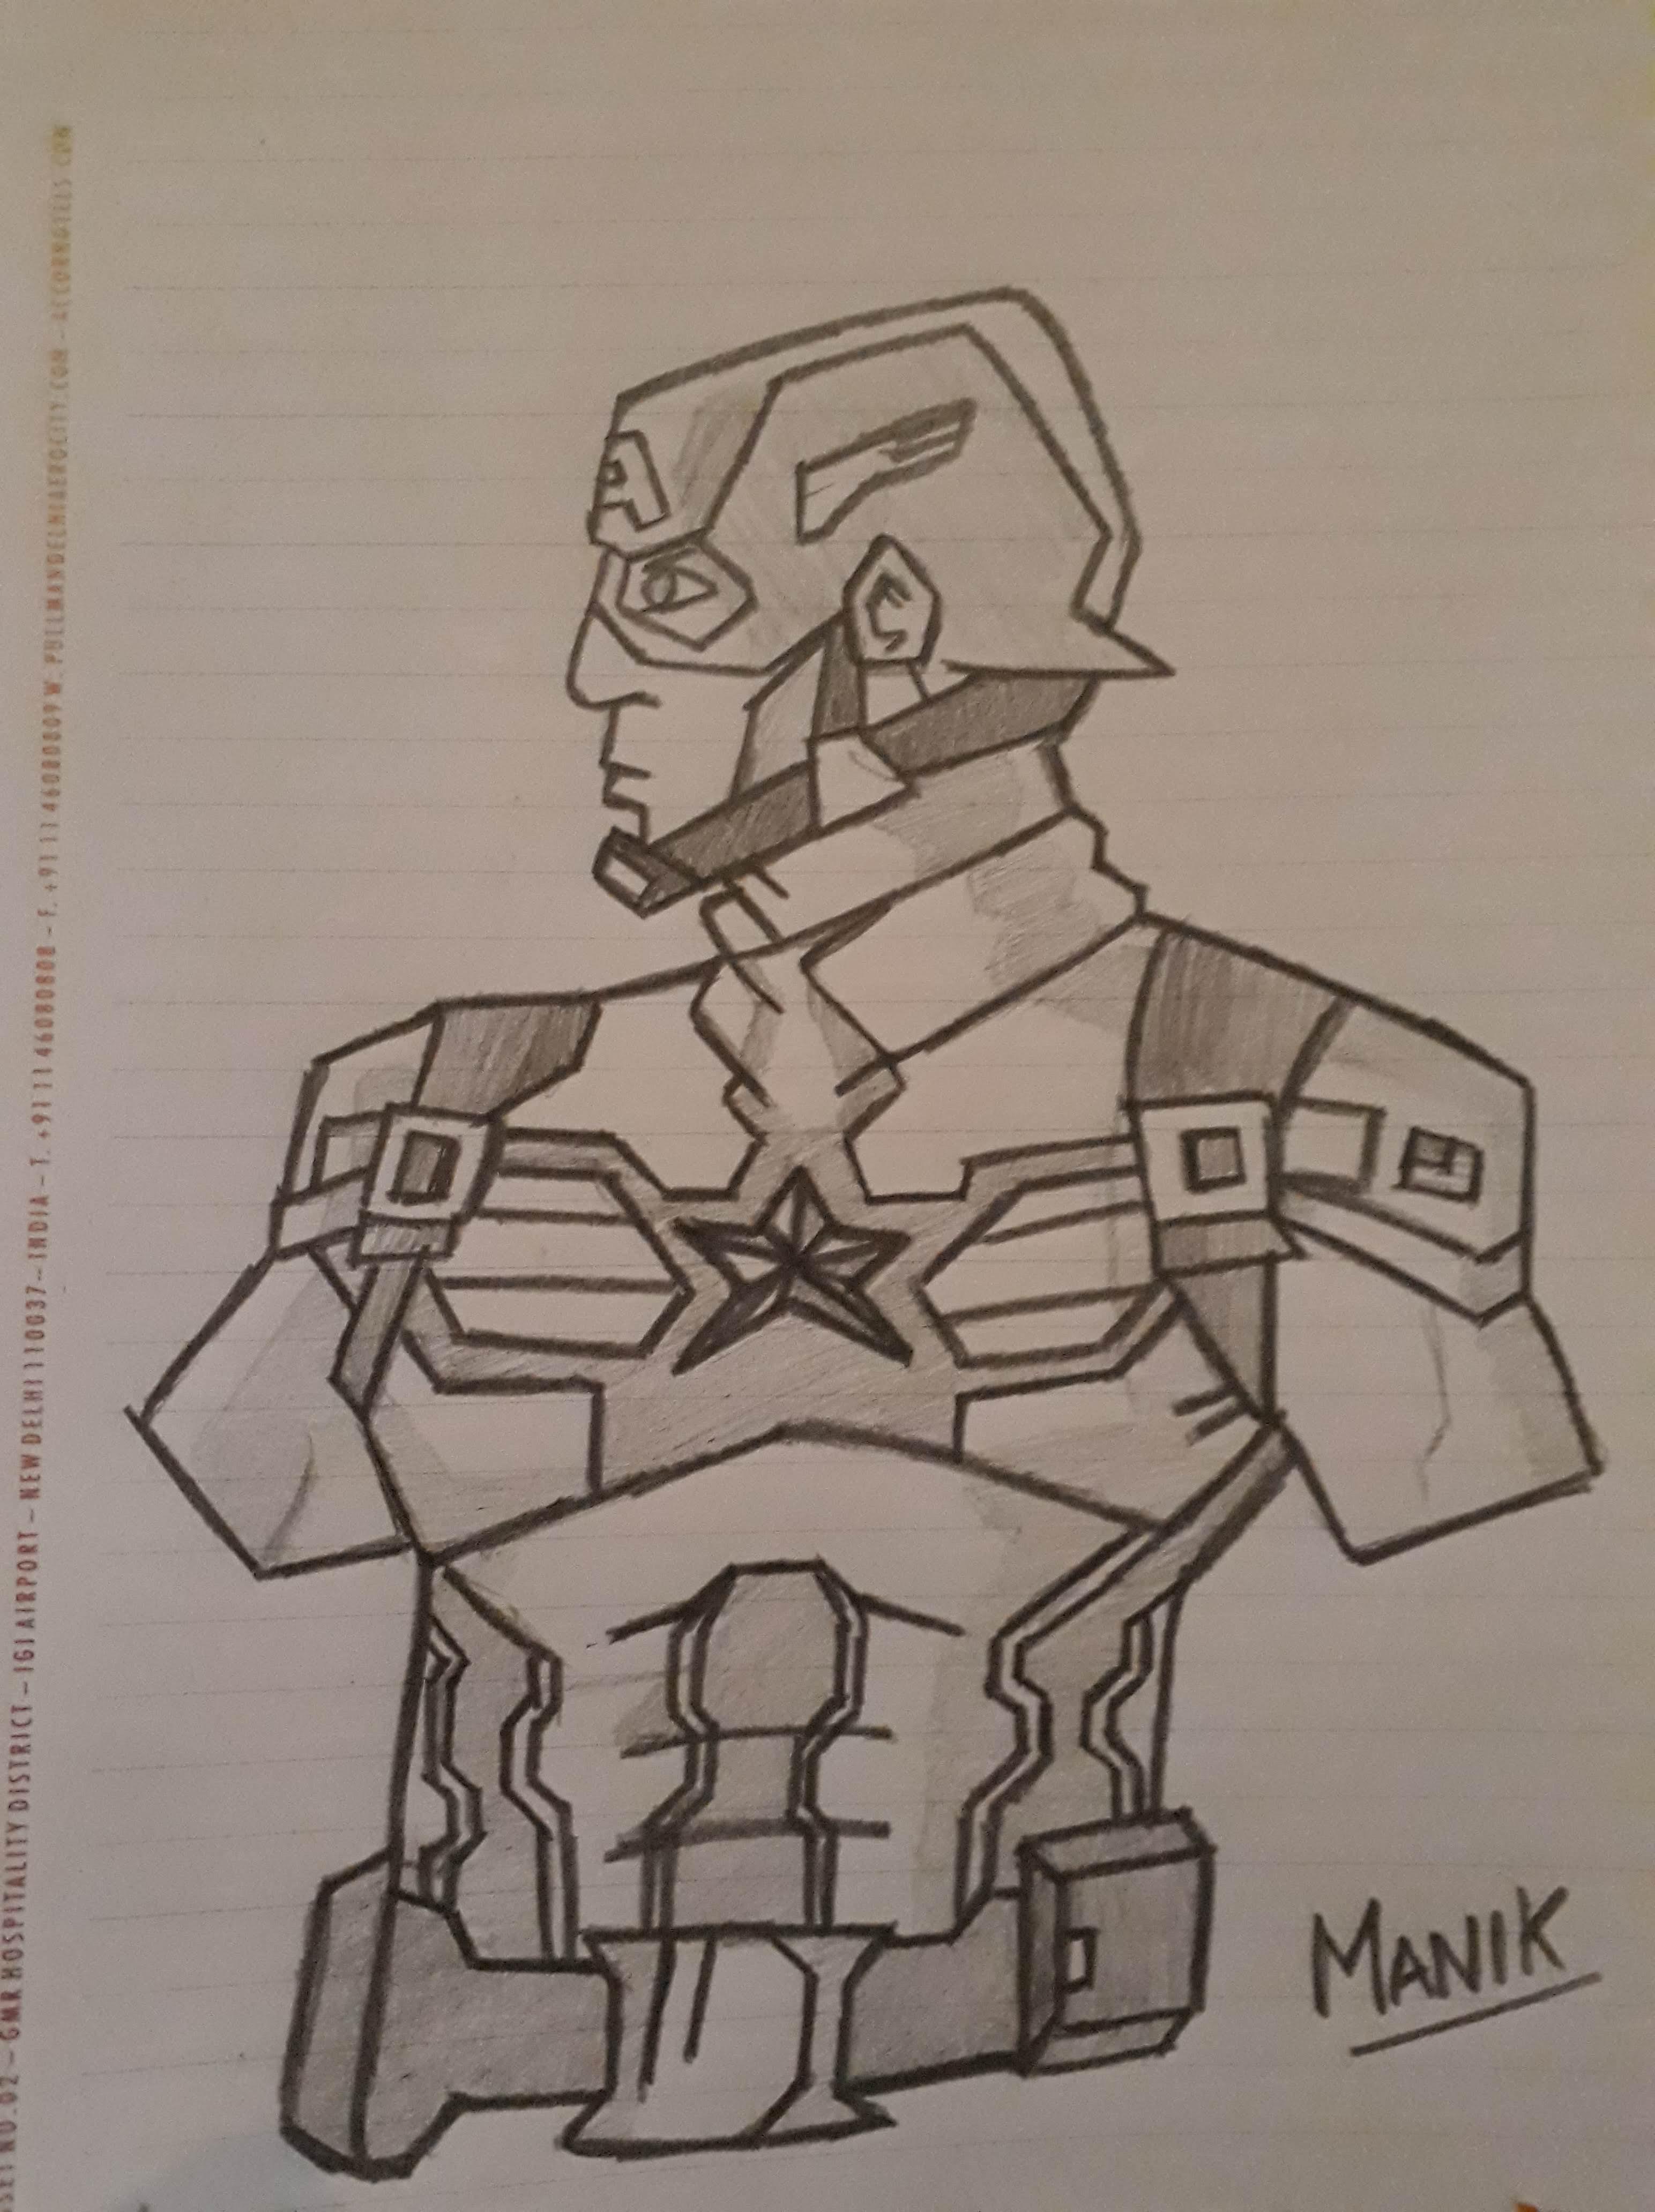 How to make a pencil sketch of Captain America